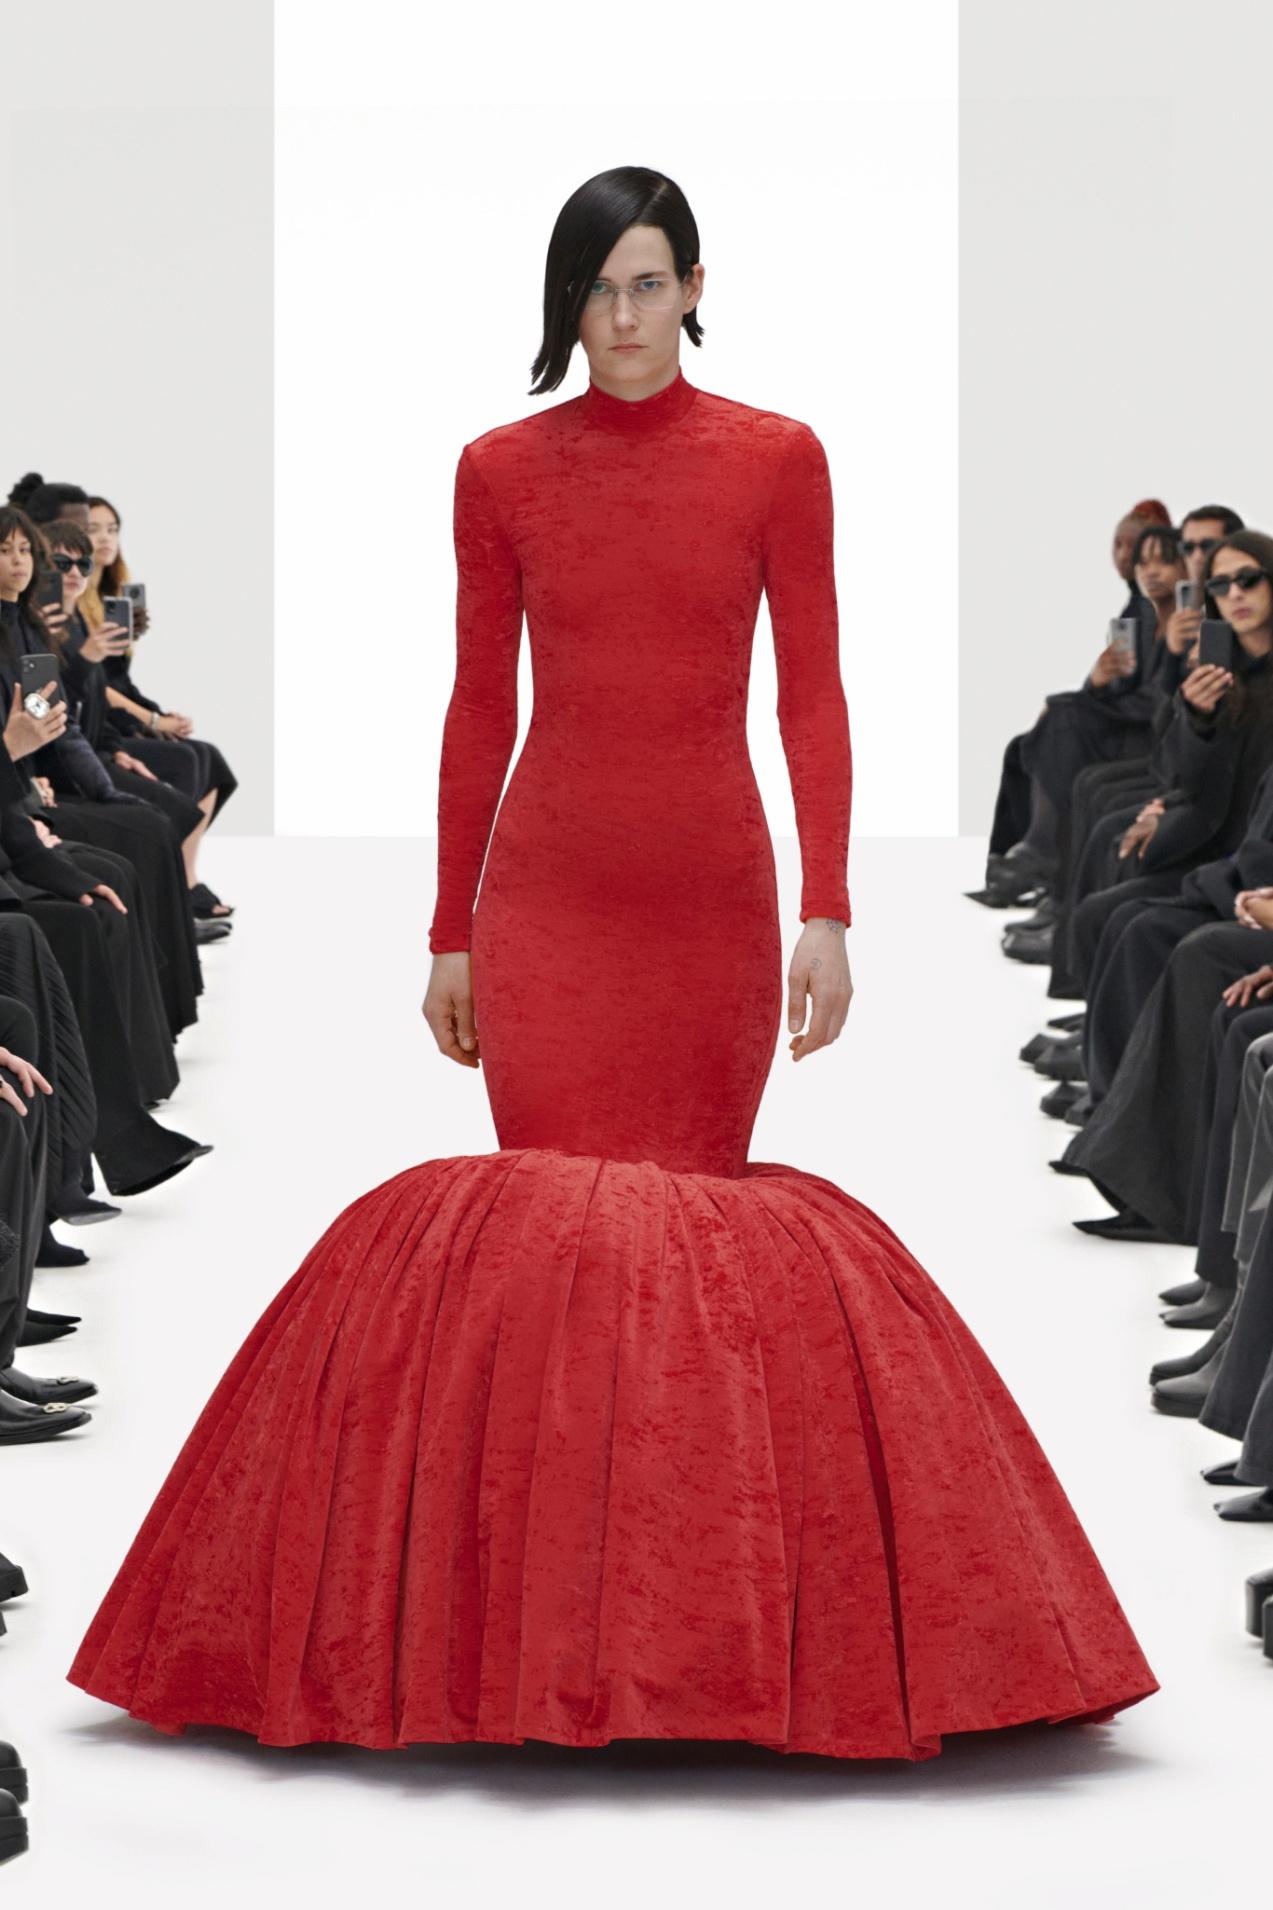 Balenciaga Spring 2022 RTW red dress.jpg